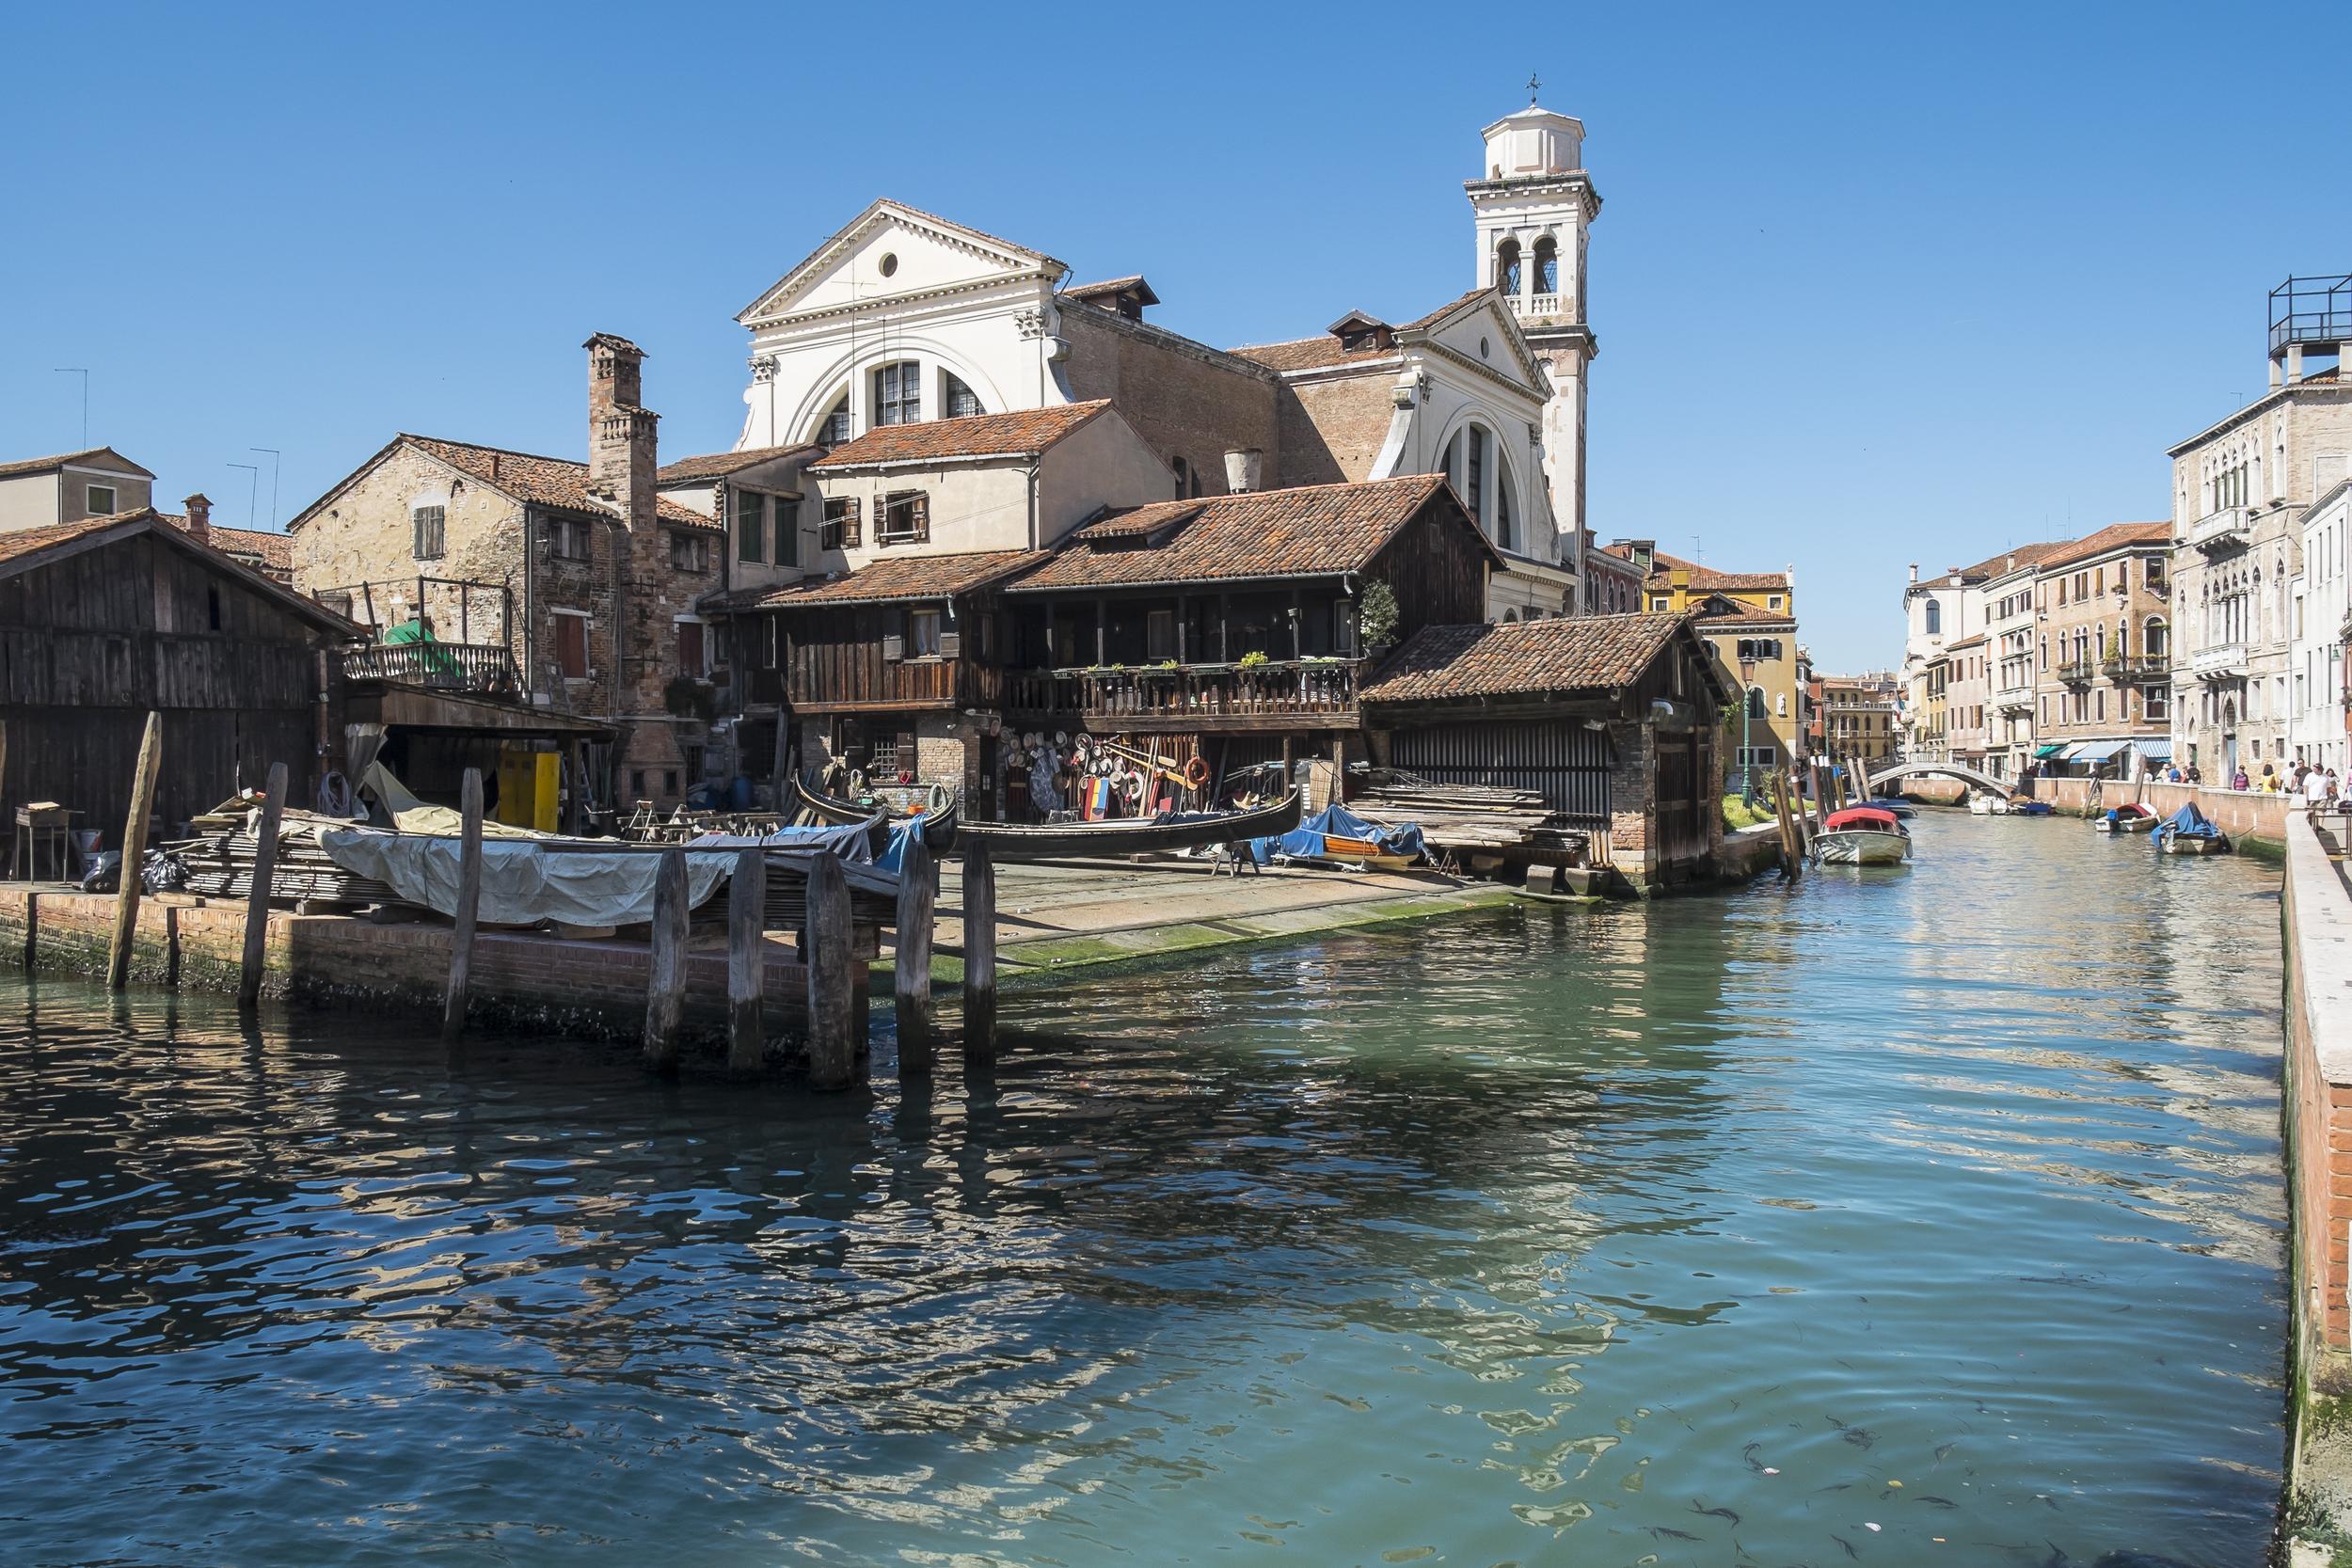 Venice-GondolaRepairYard-20140524-DSCF6074.jpg